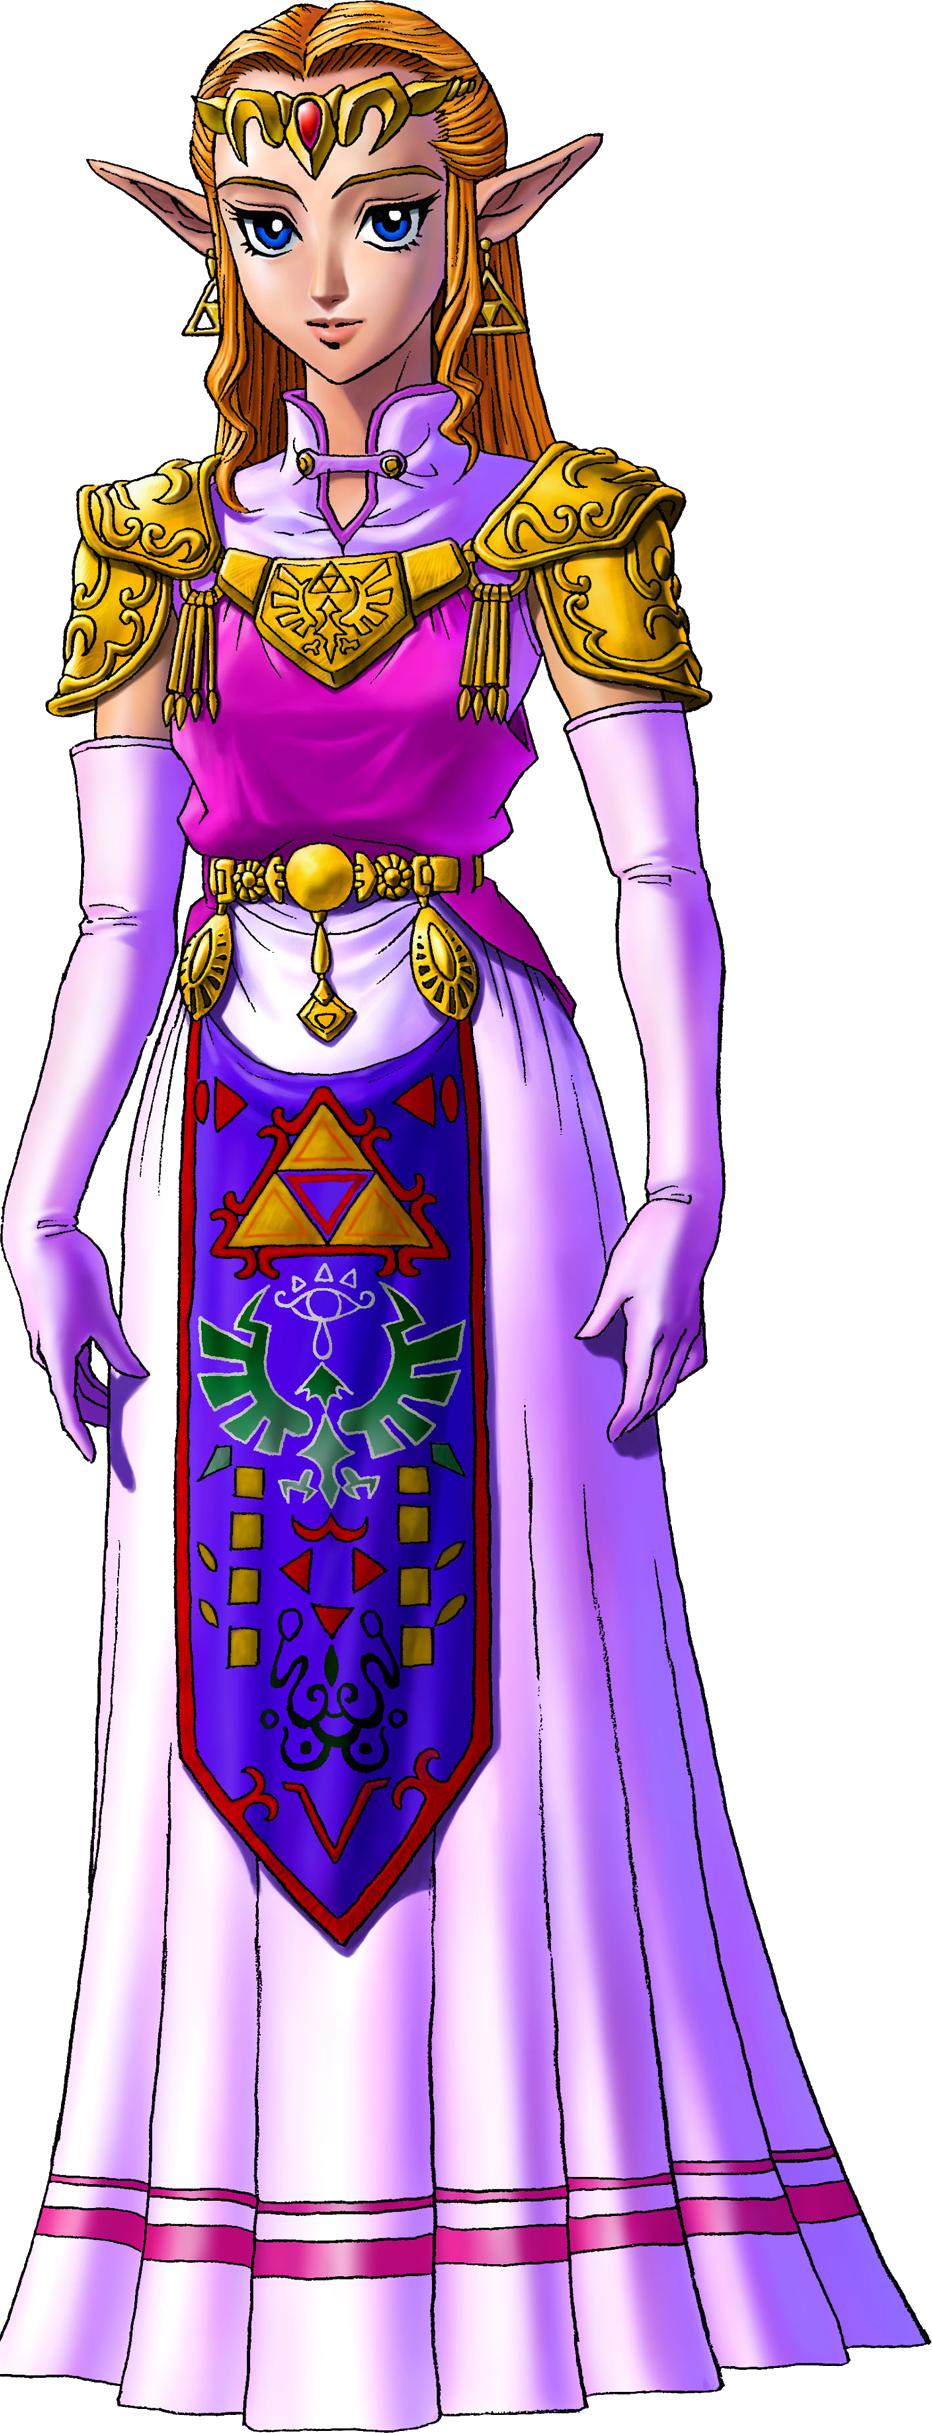 The Legend Of Zelda Ocarina Of Time Characters Zeldapedia